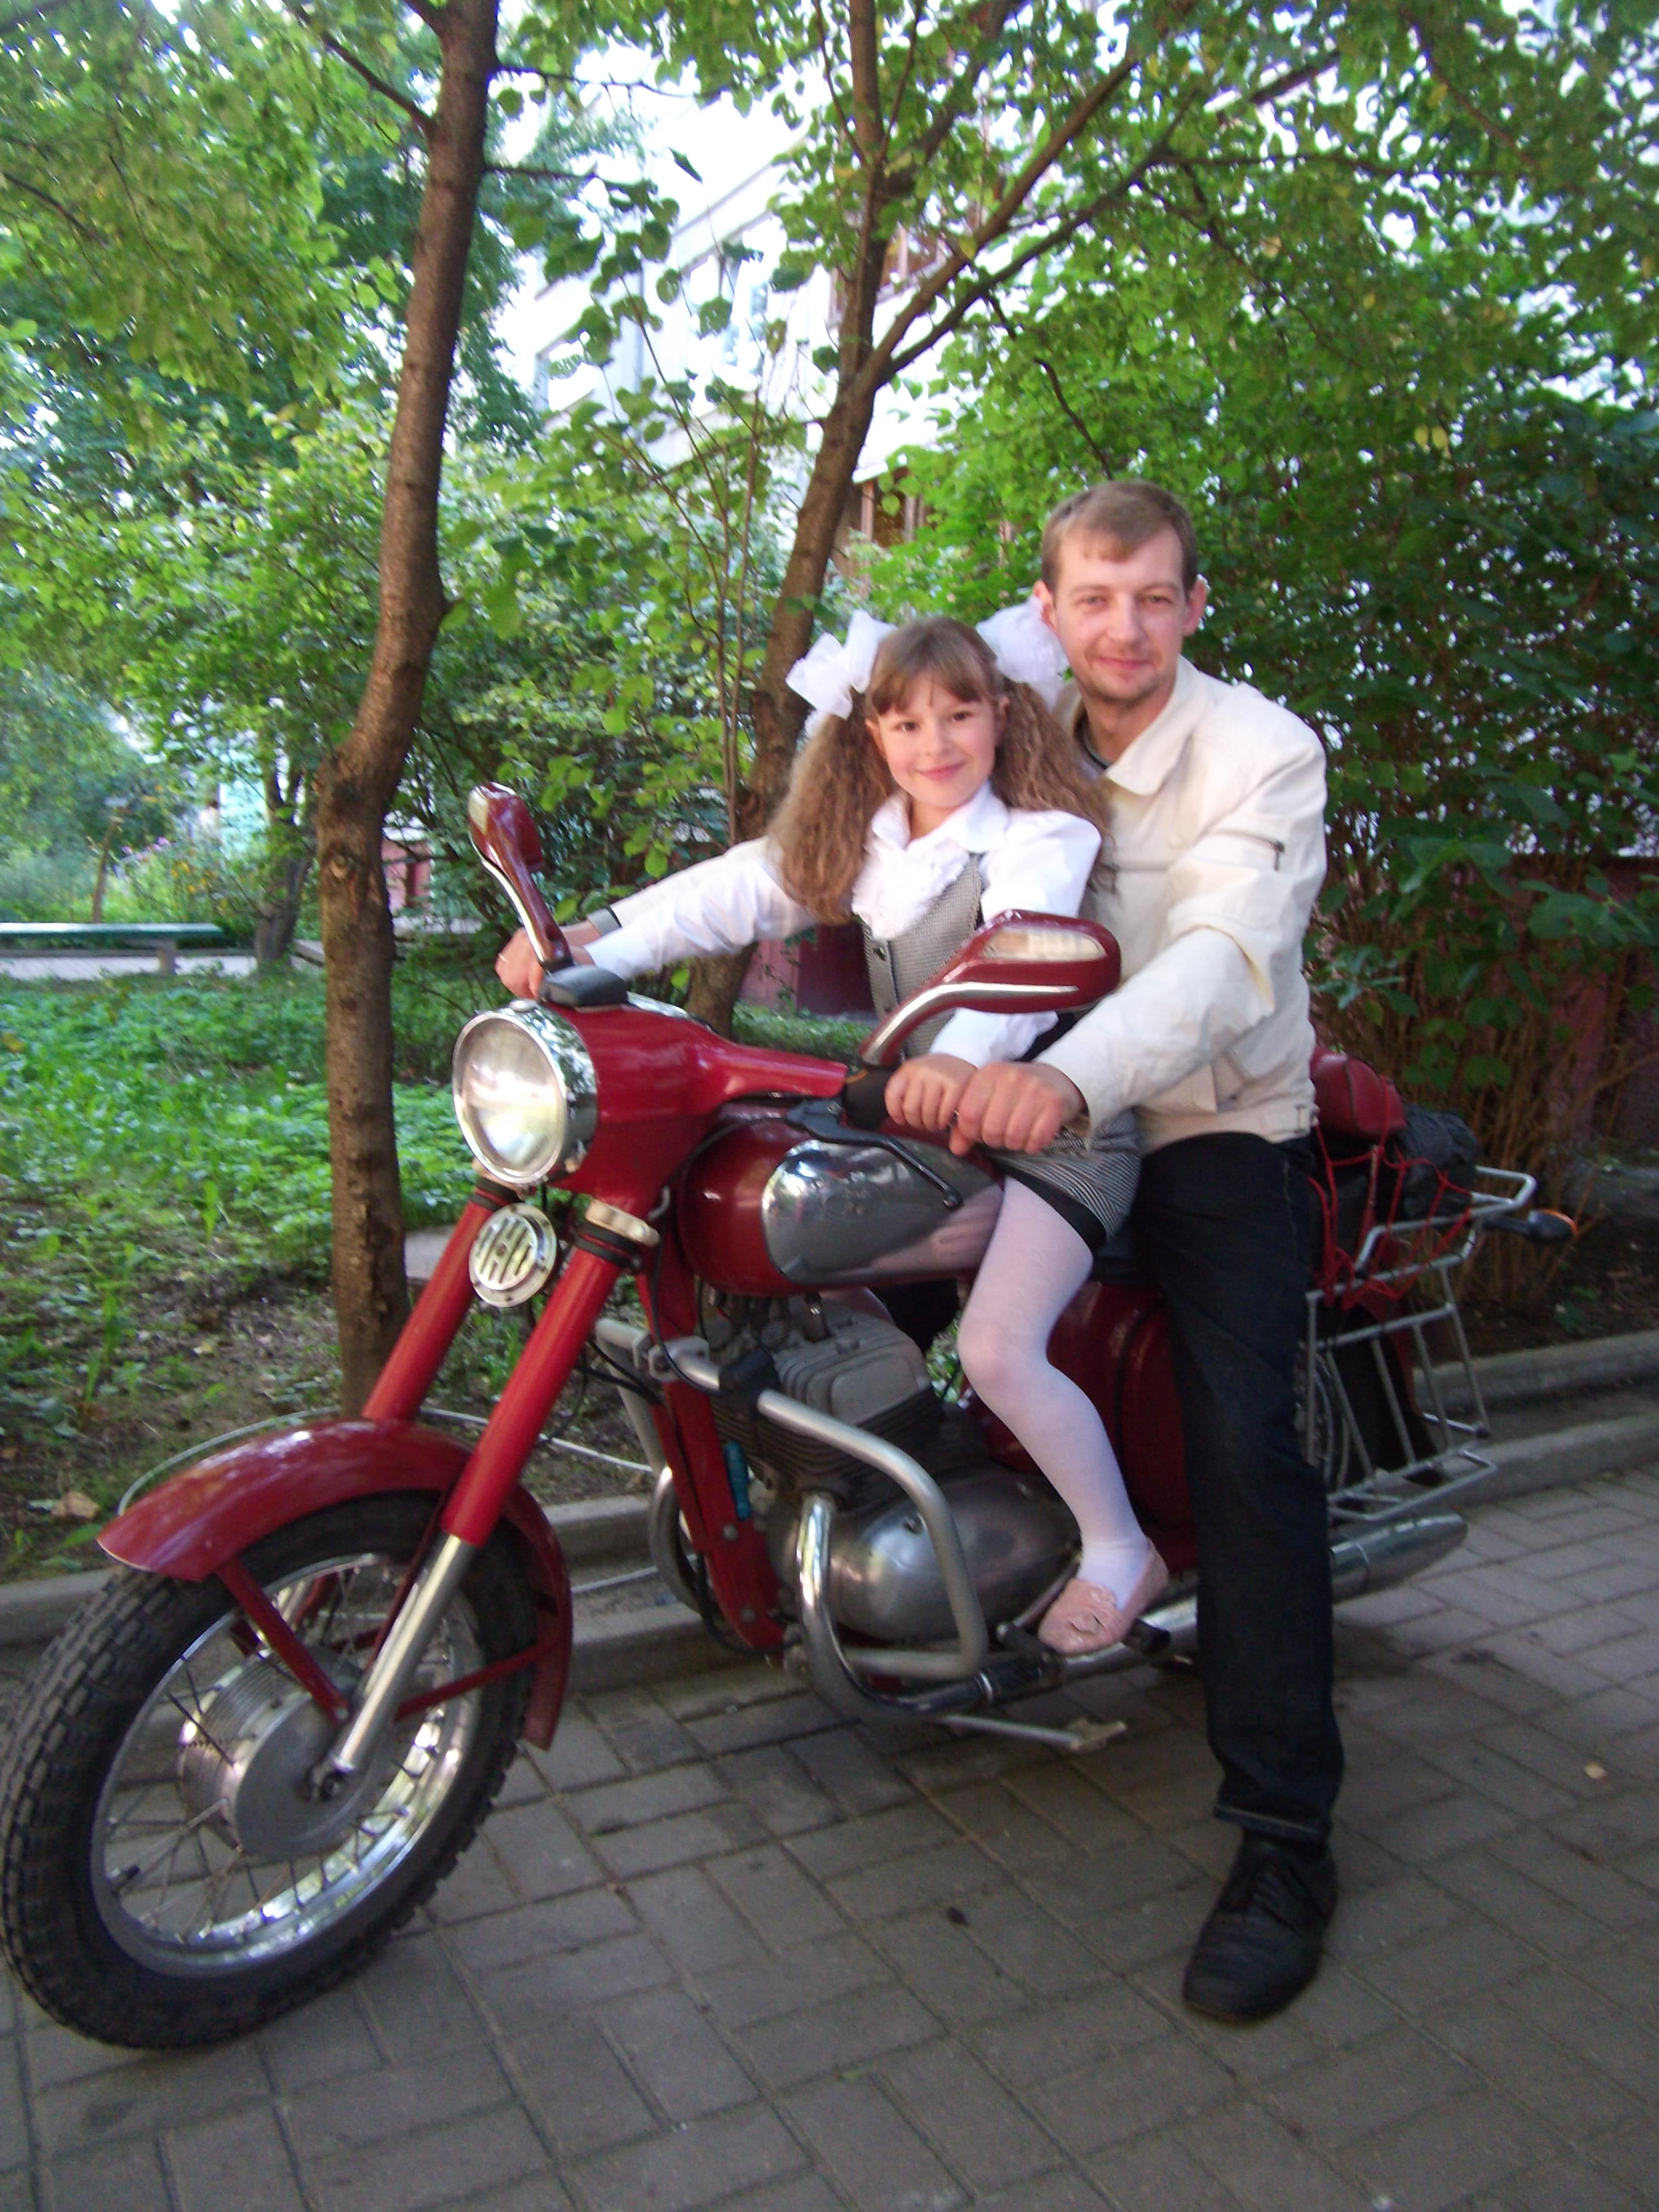 www.bildites.lv/images/rayzxp0iynu6jpbrobpt.jpg